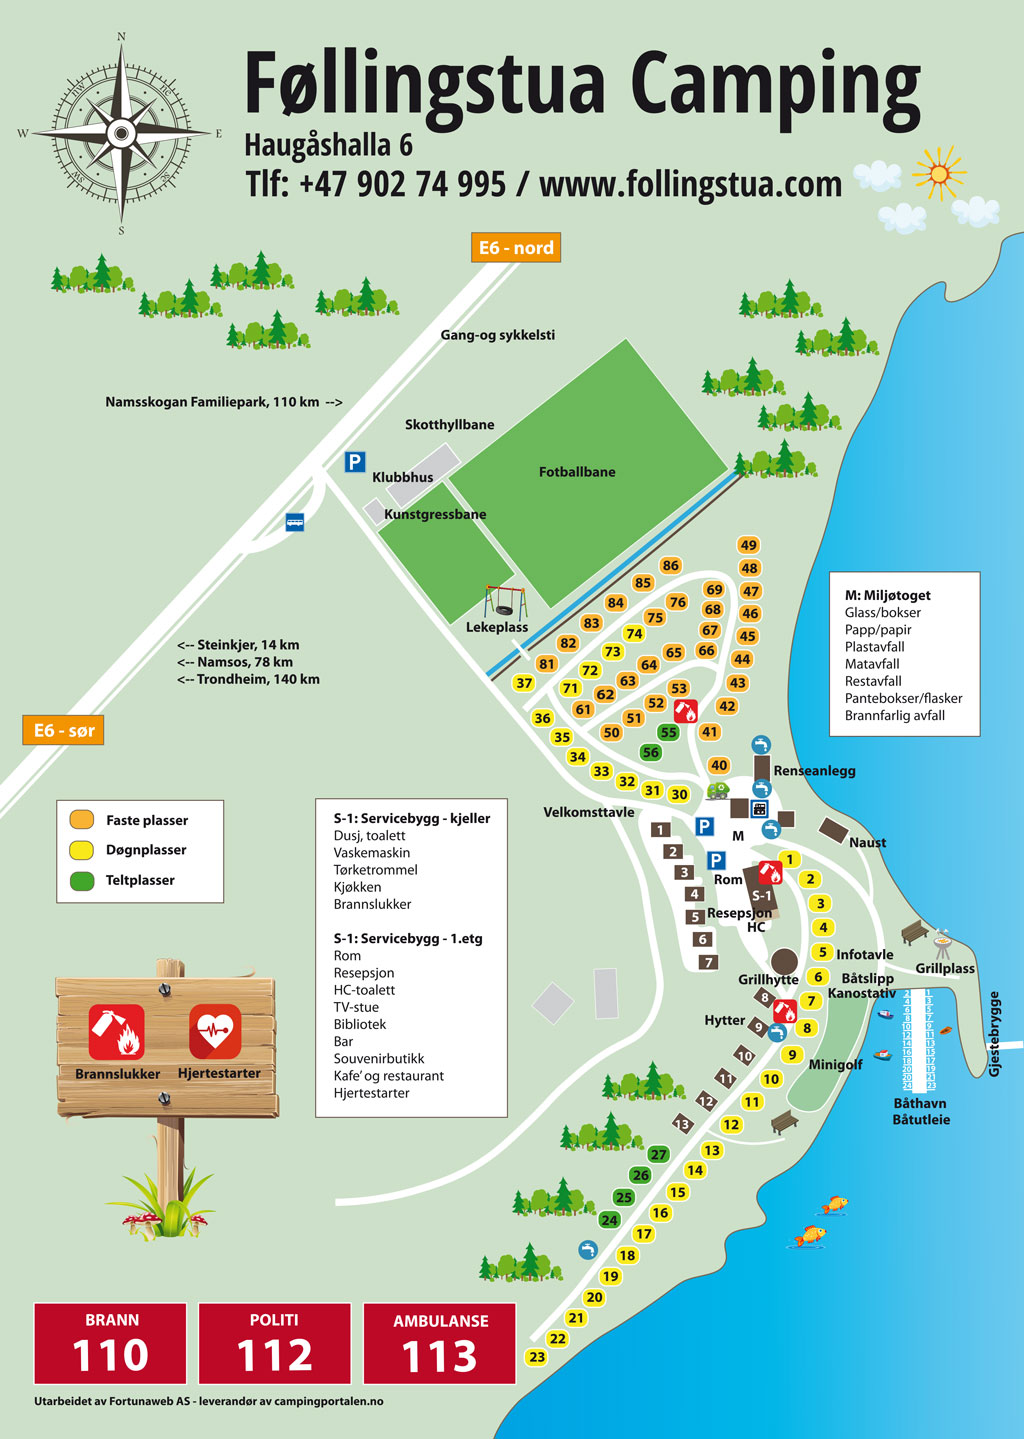 Camping map - Føllingstua Camping